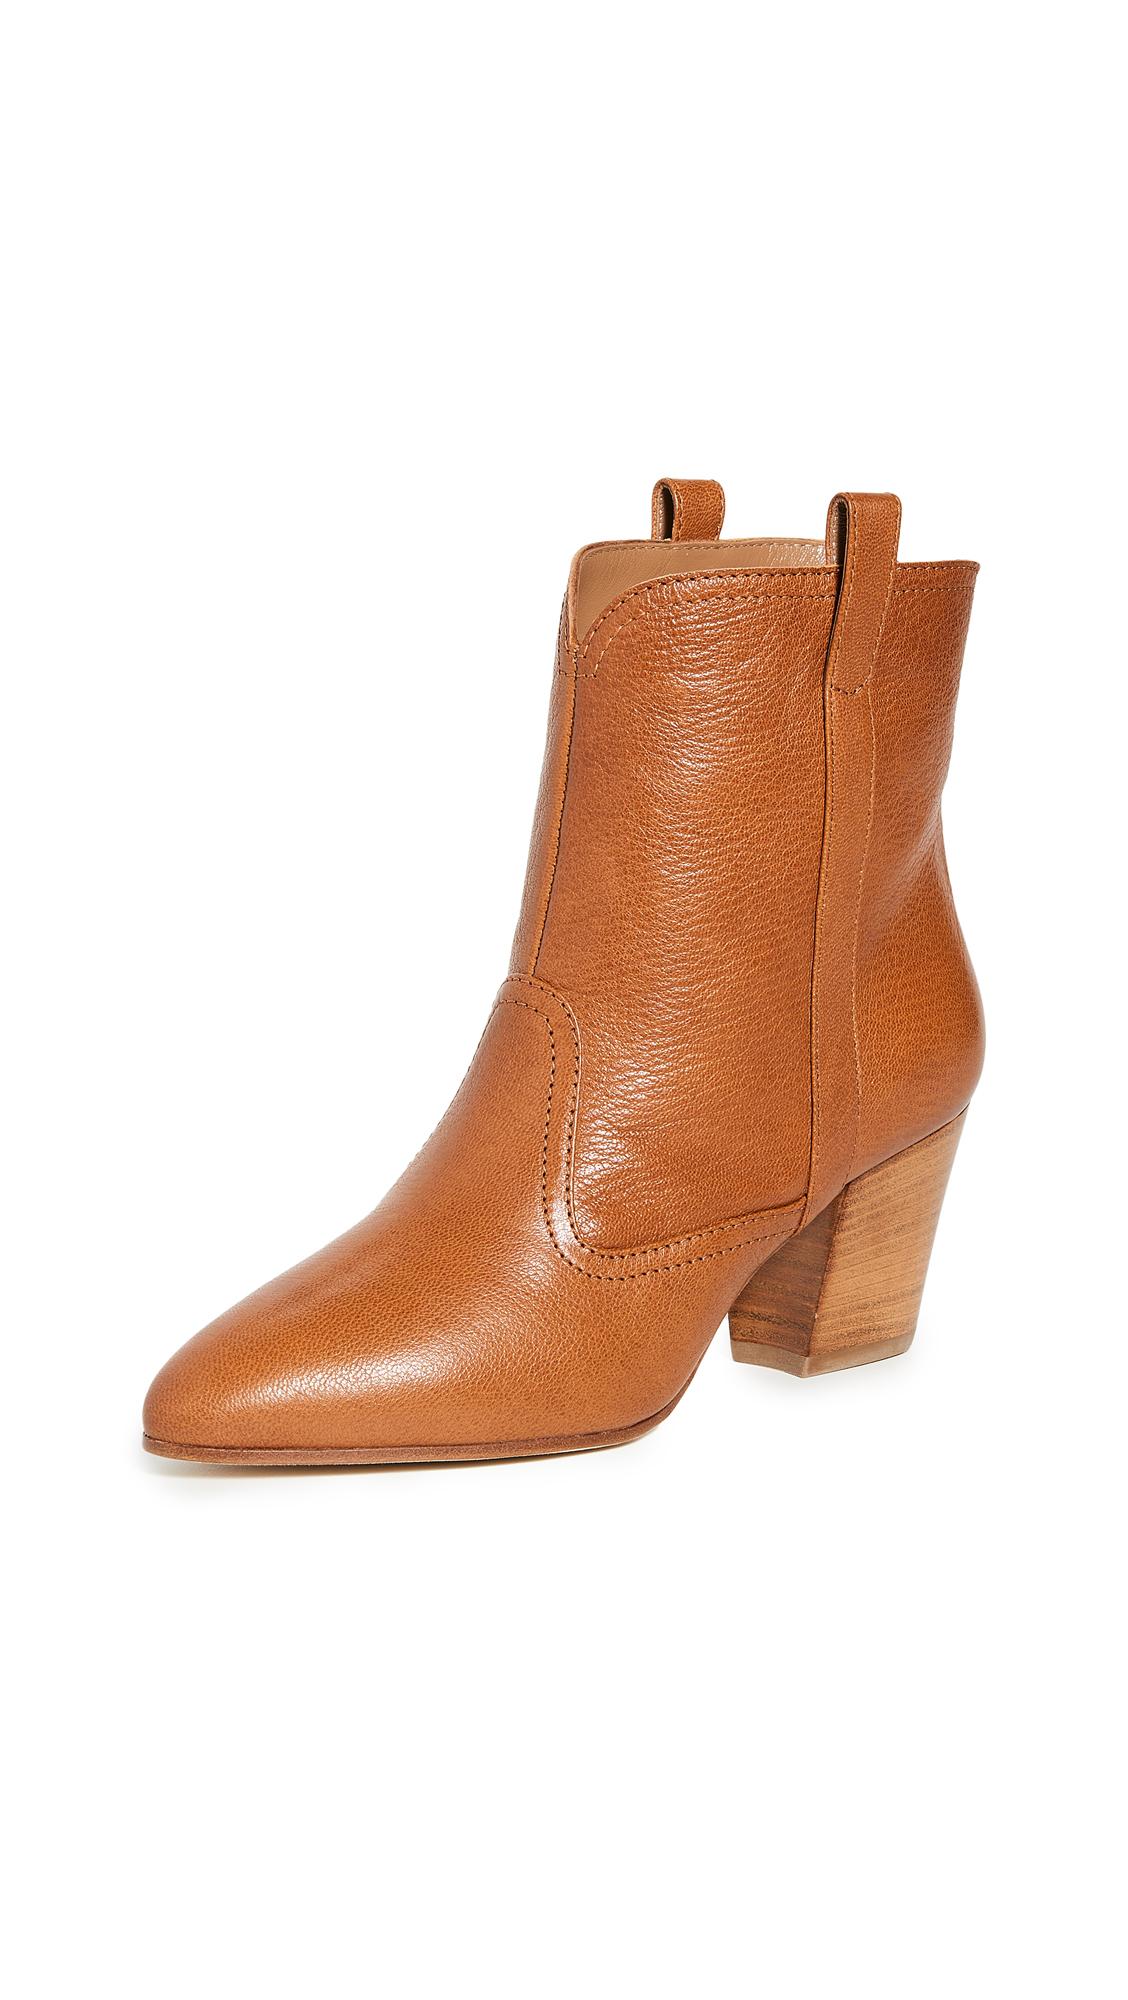 Laurence Dacade Sheryll Boots - 50% Off Sale